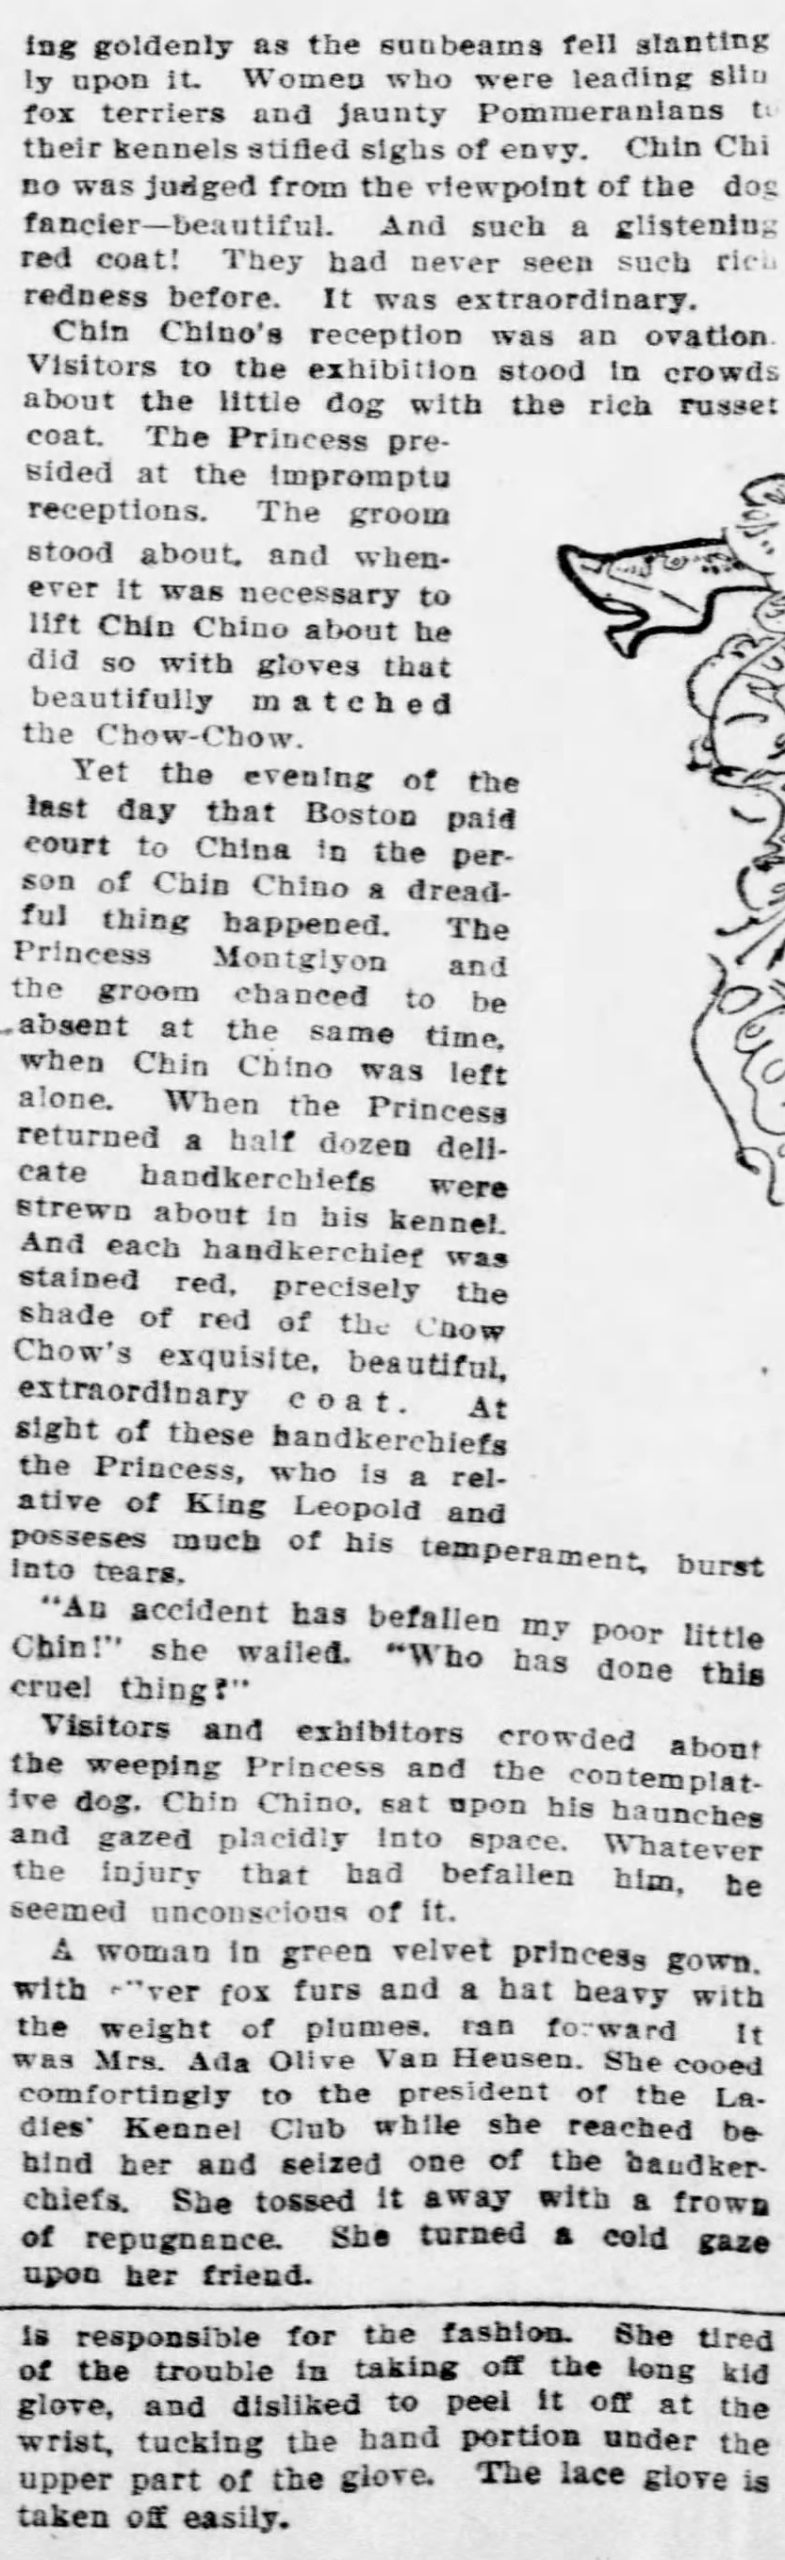 Page e Chin Chino article 1907 - Version e